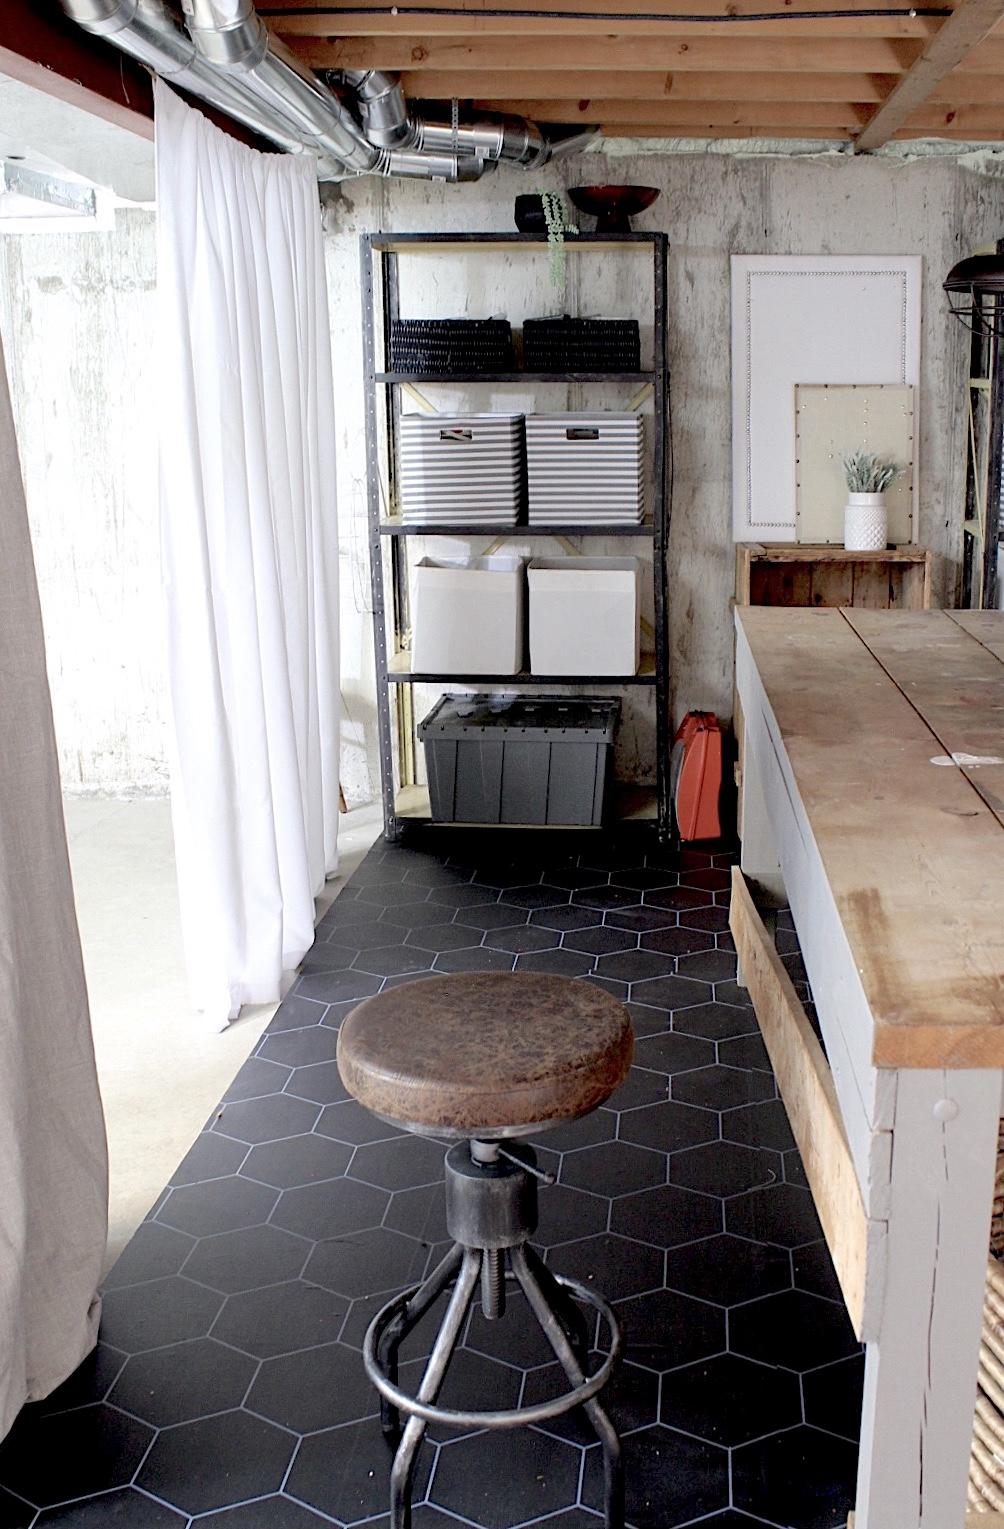 Create an Atelier Art Studio in an Unfinished Basement